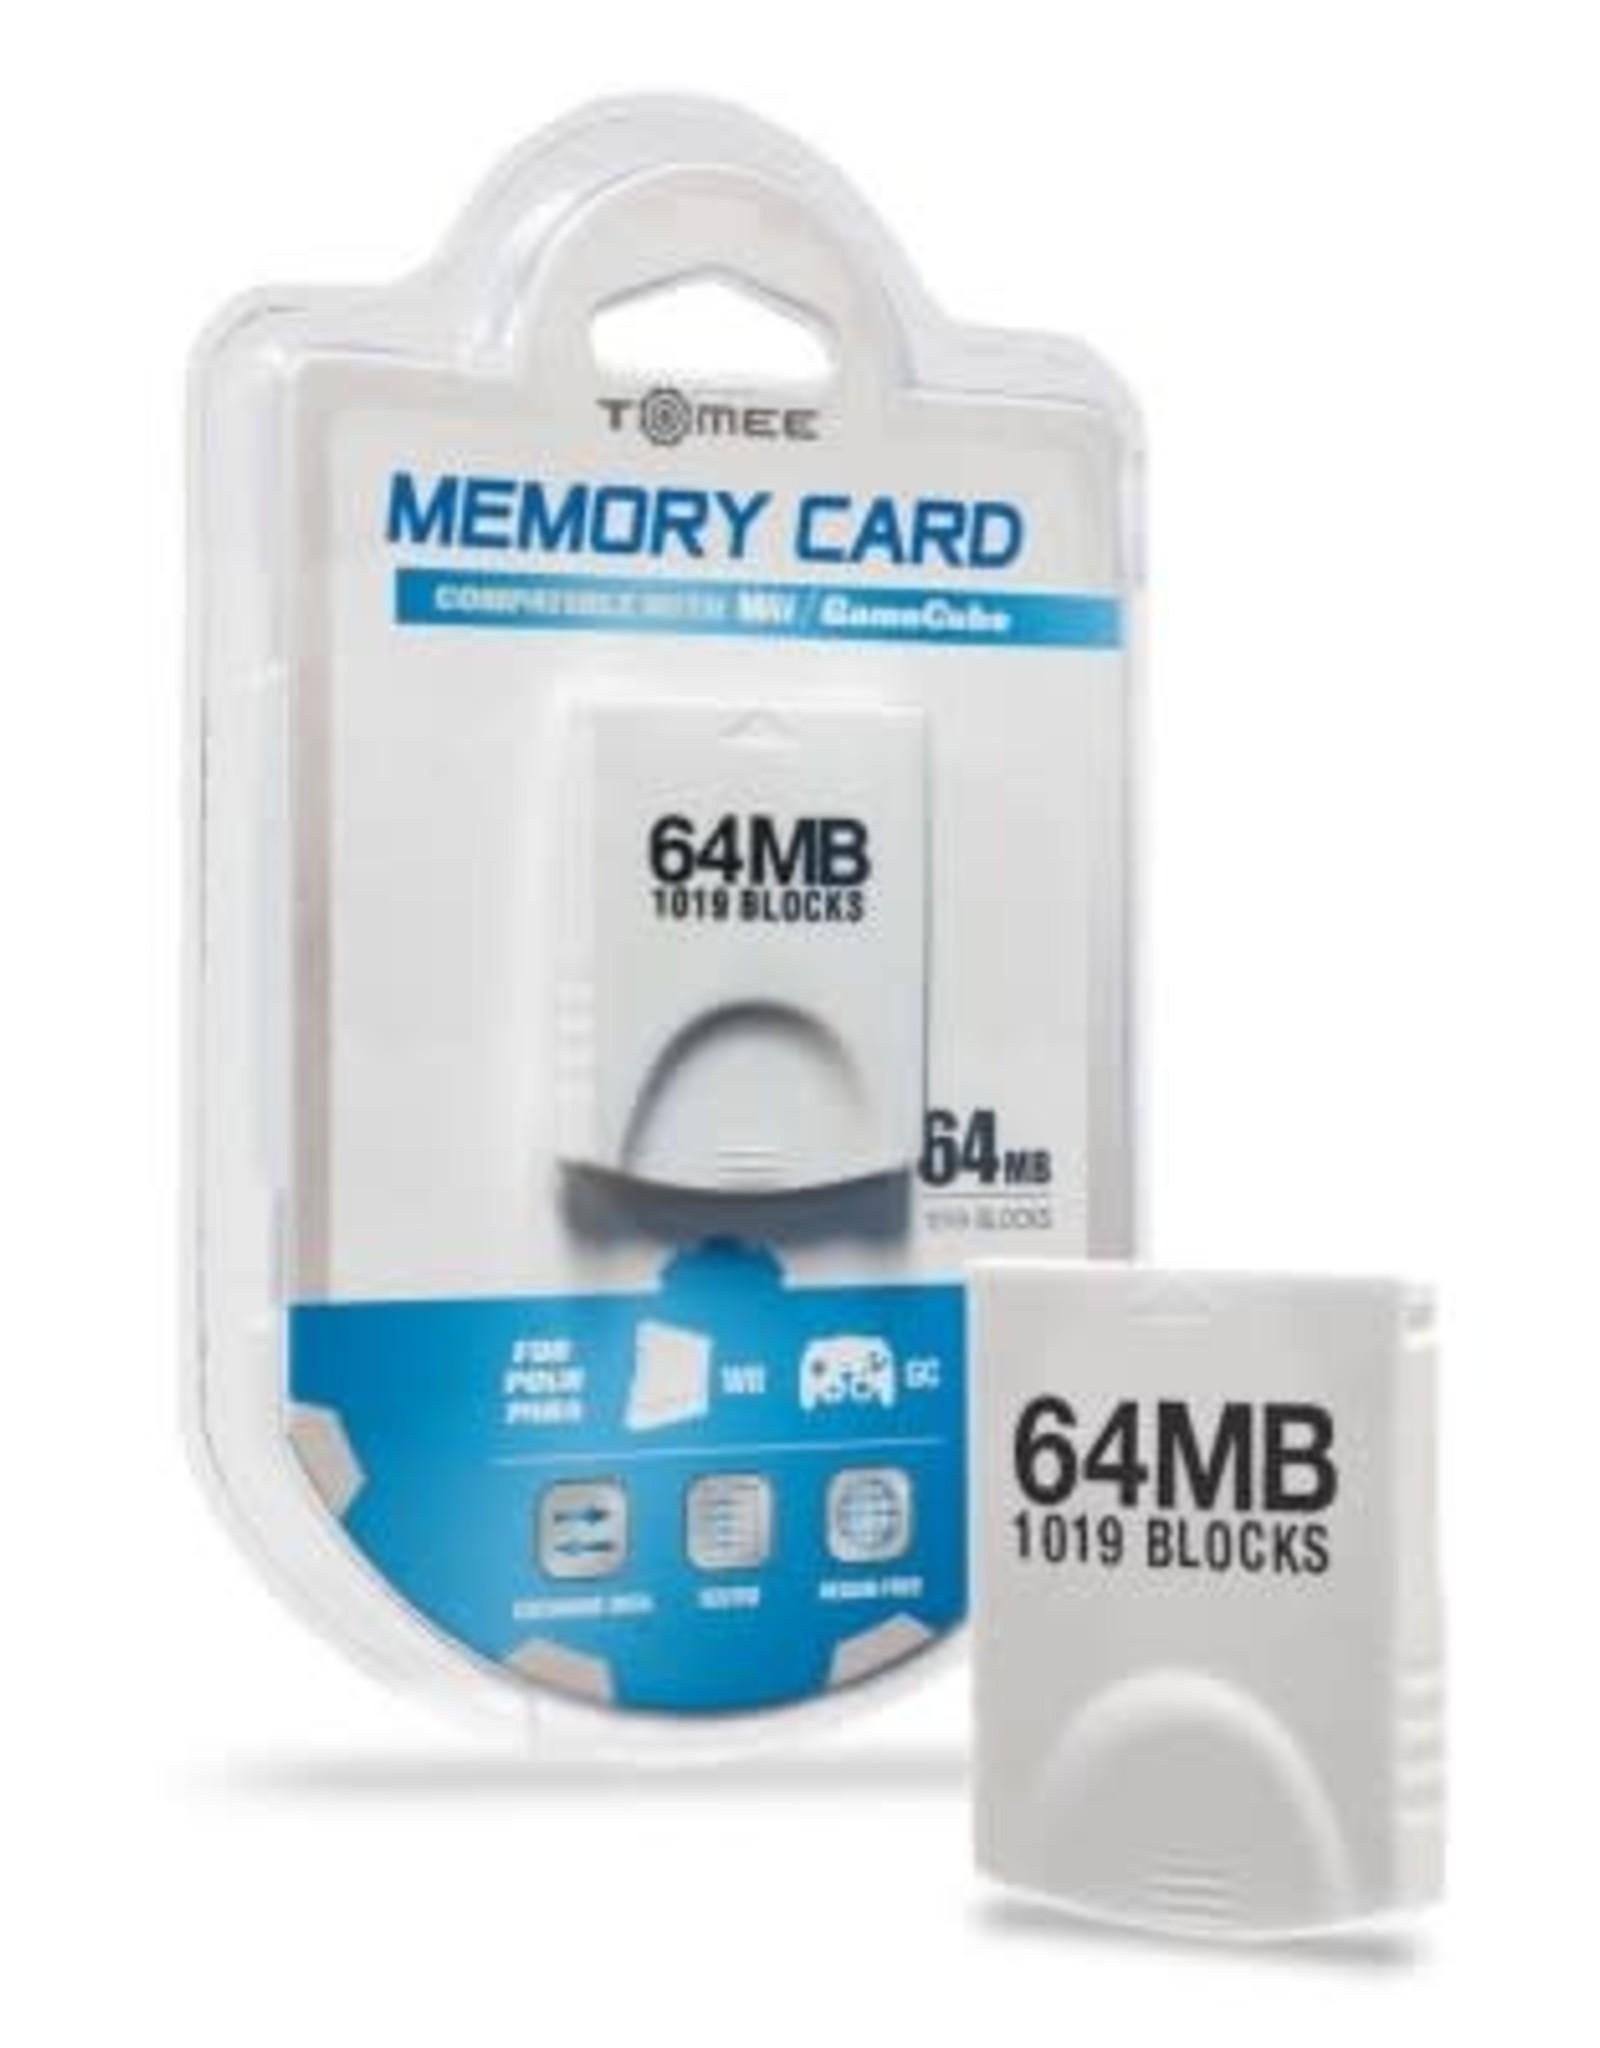 Hyperkin 64MB Gamecube Memory Card